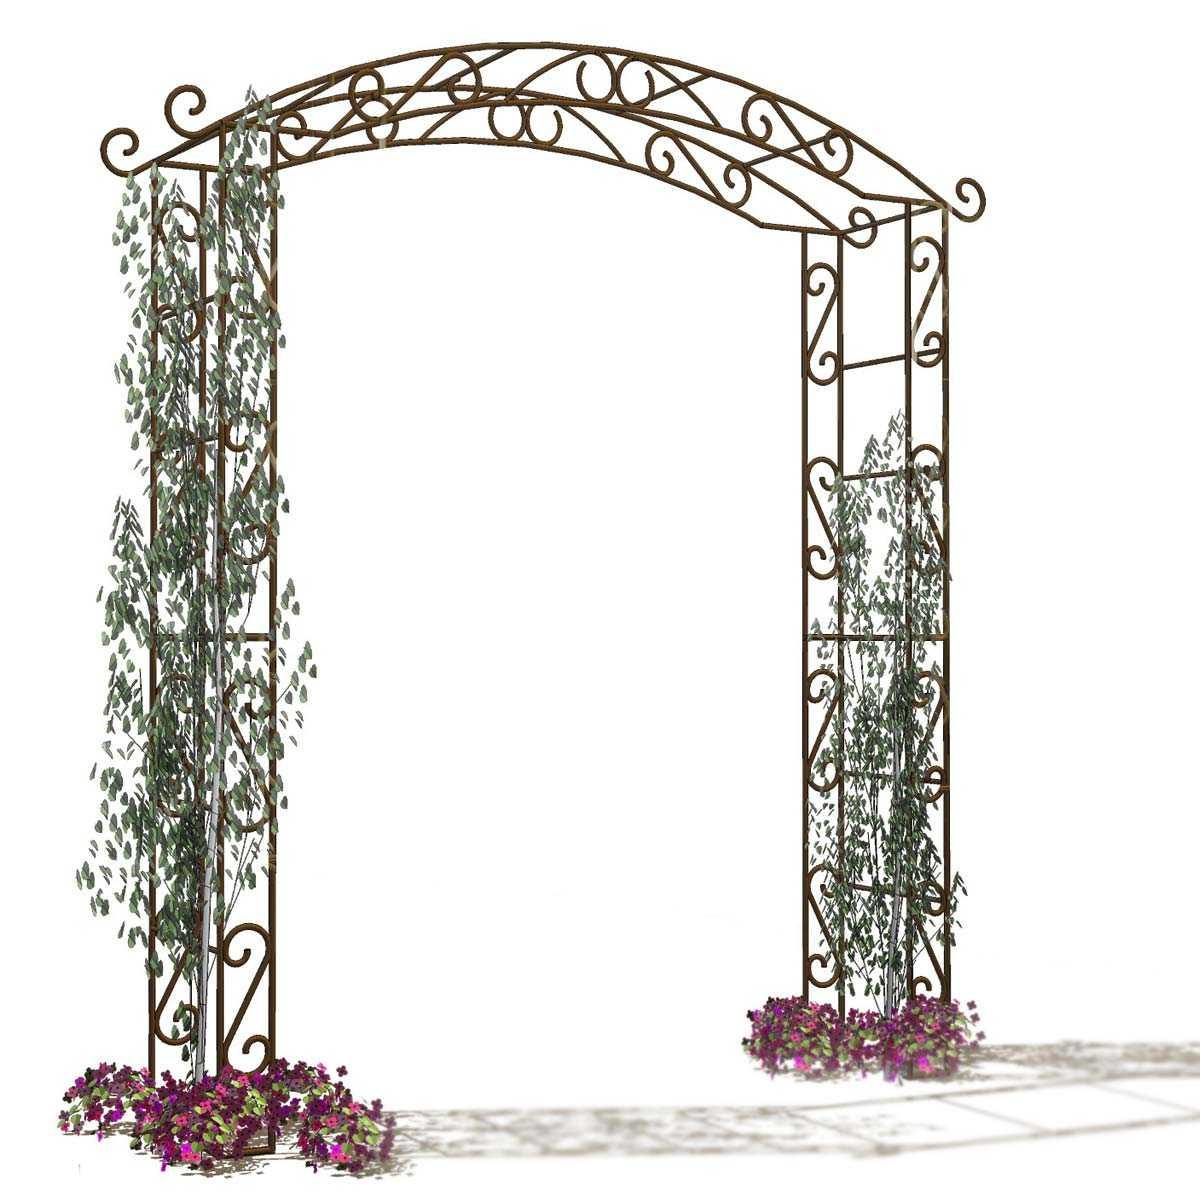 Arche De Jardin En Fer Pagode concernant Arche Bois Jardin